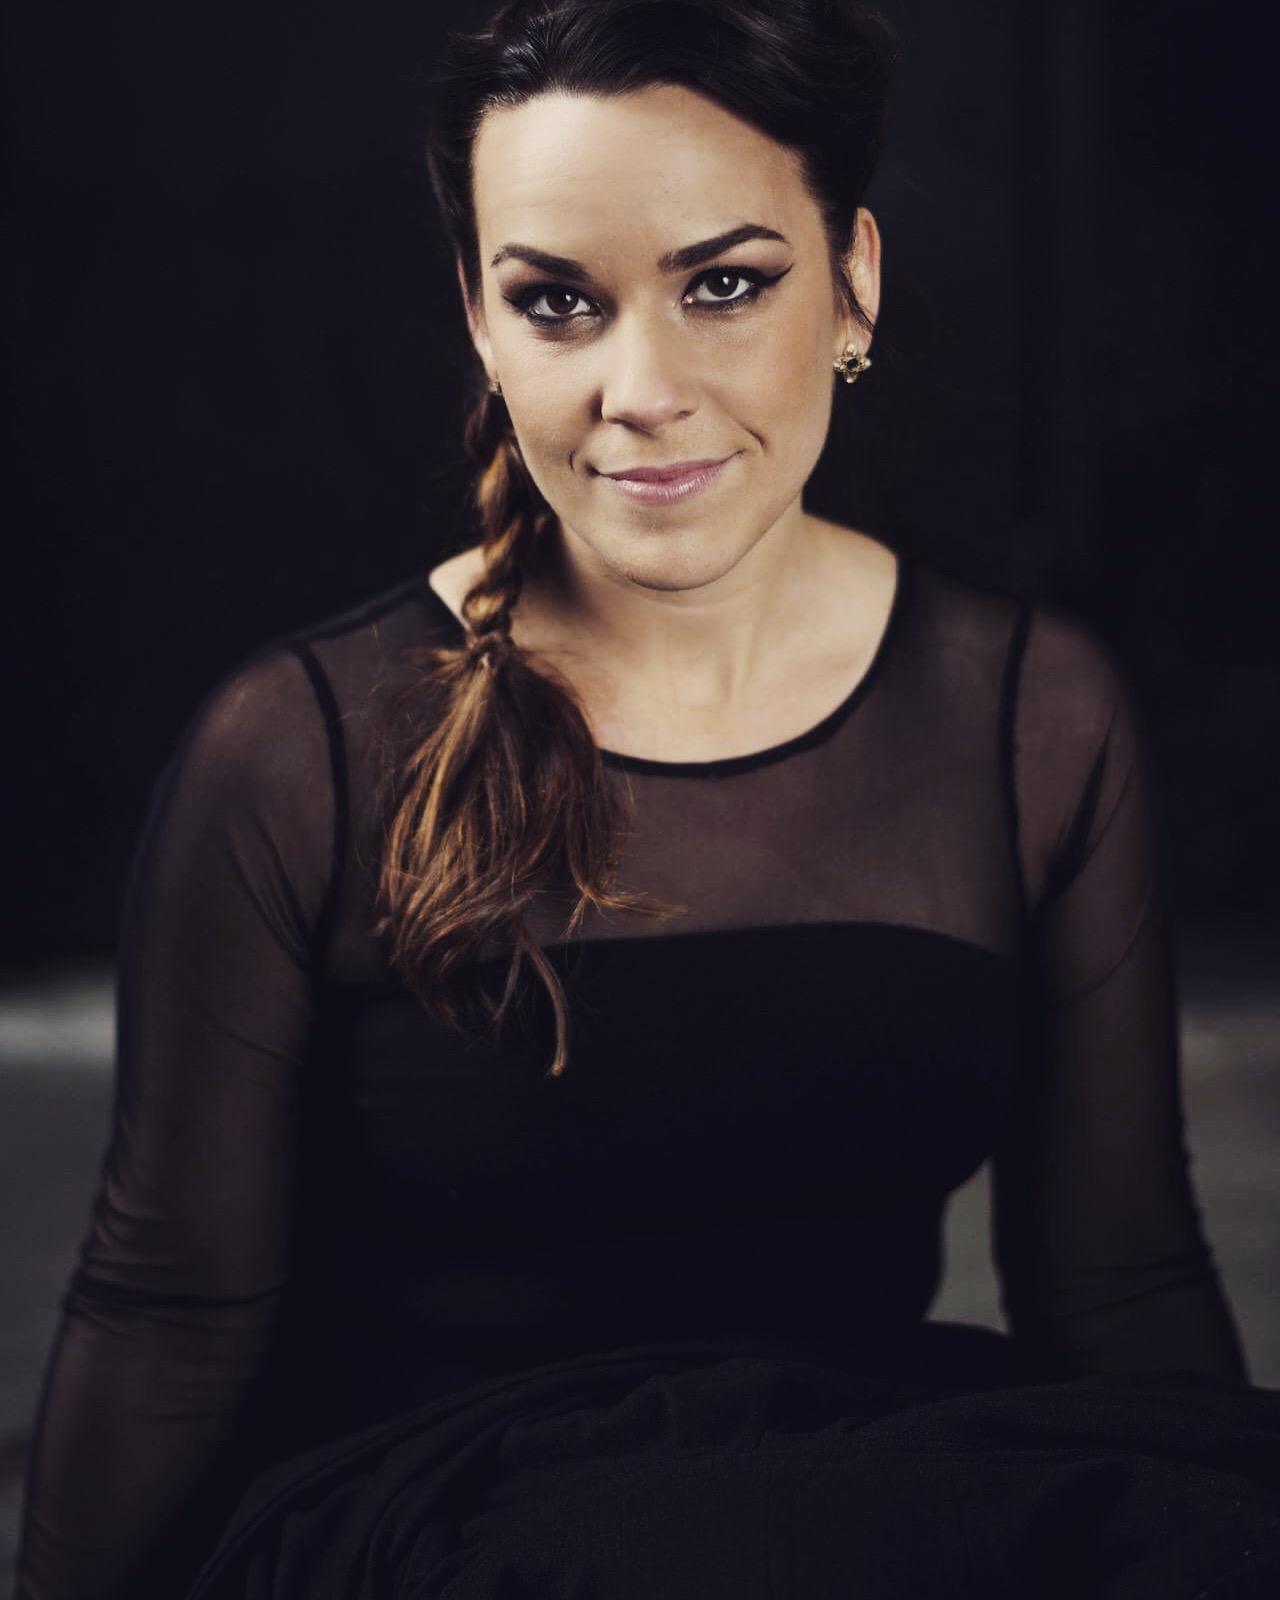 Konsert - Anna Louise Ekman - Songs from My Southern County & Italian Soul